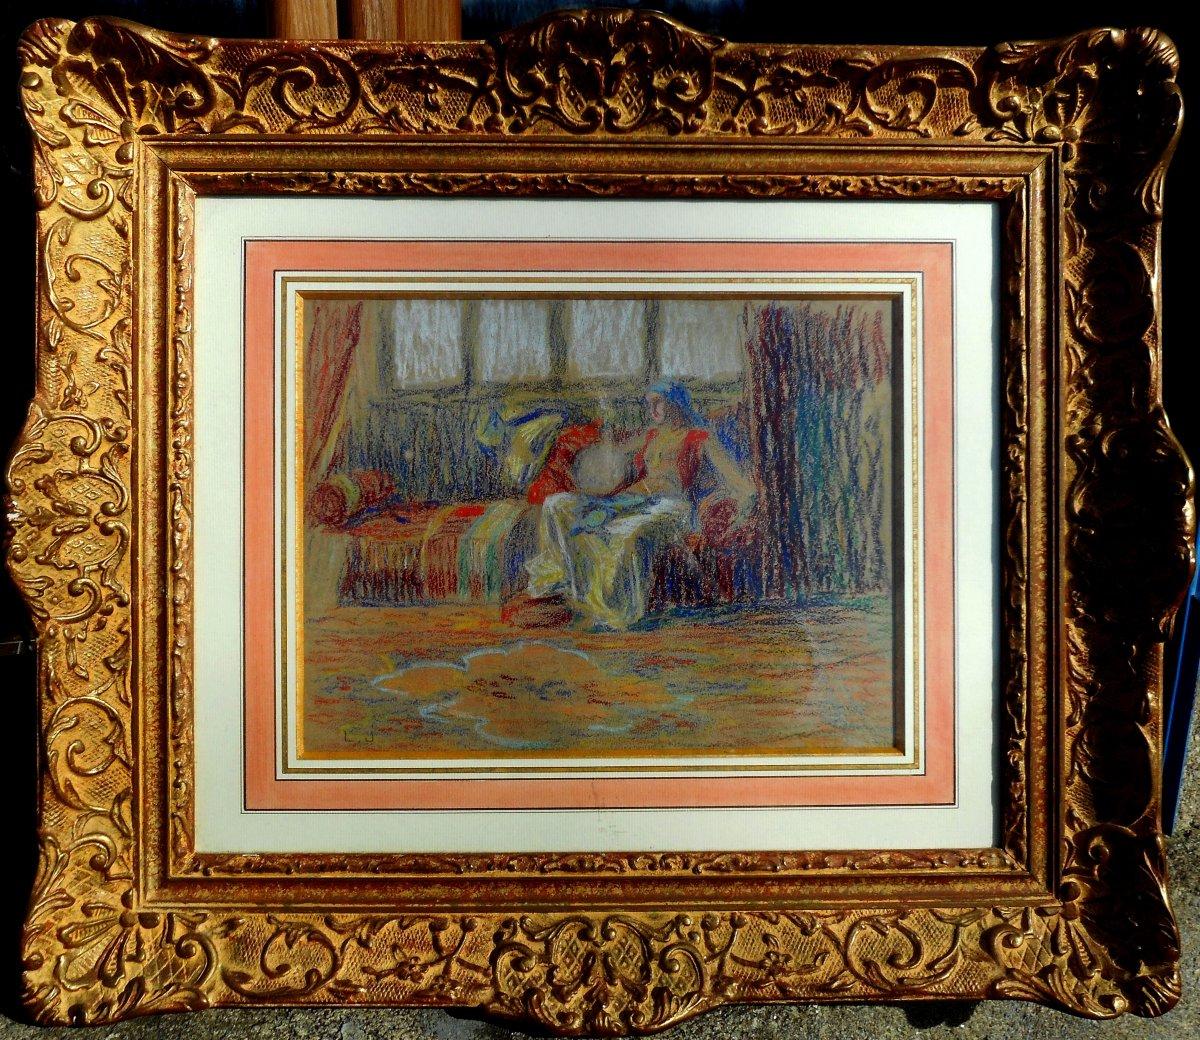 Léon Jouhaud (leon Jouhaud 1874-1950) Limoges - Gitane 1907